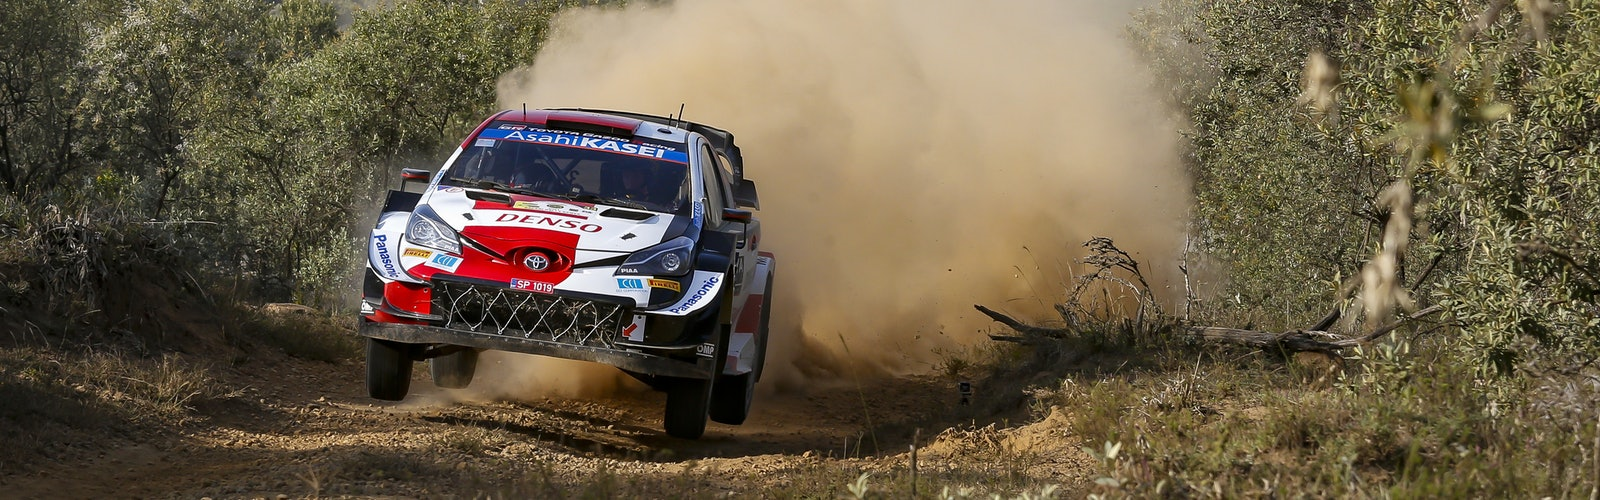 WRC_2021_Rd.6_135